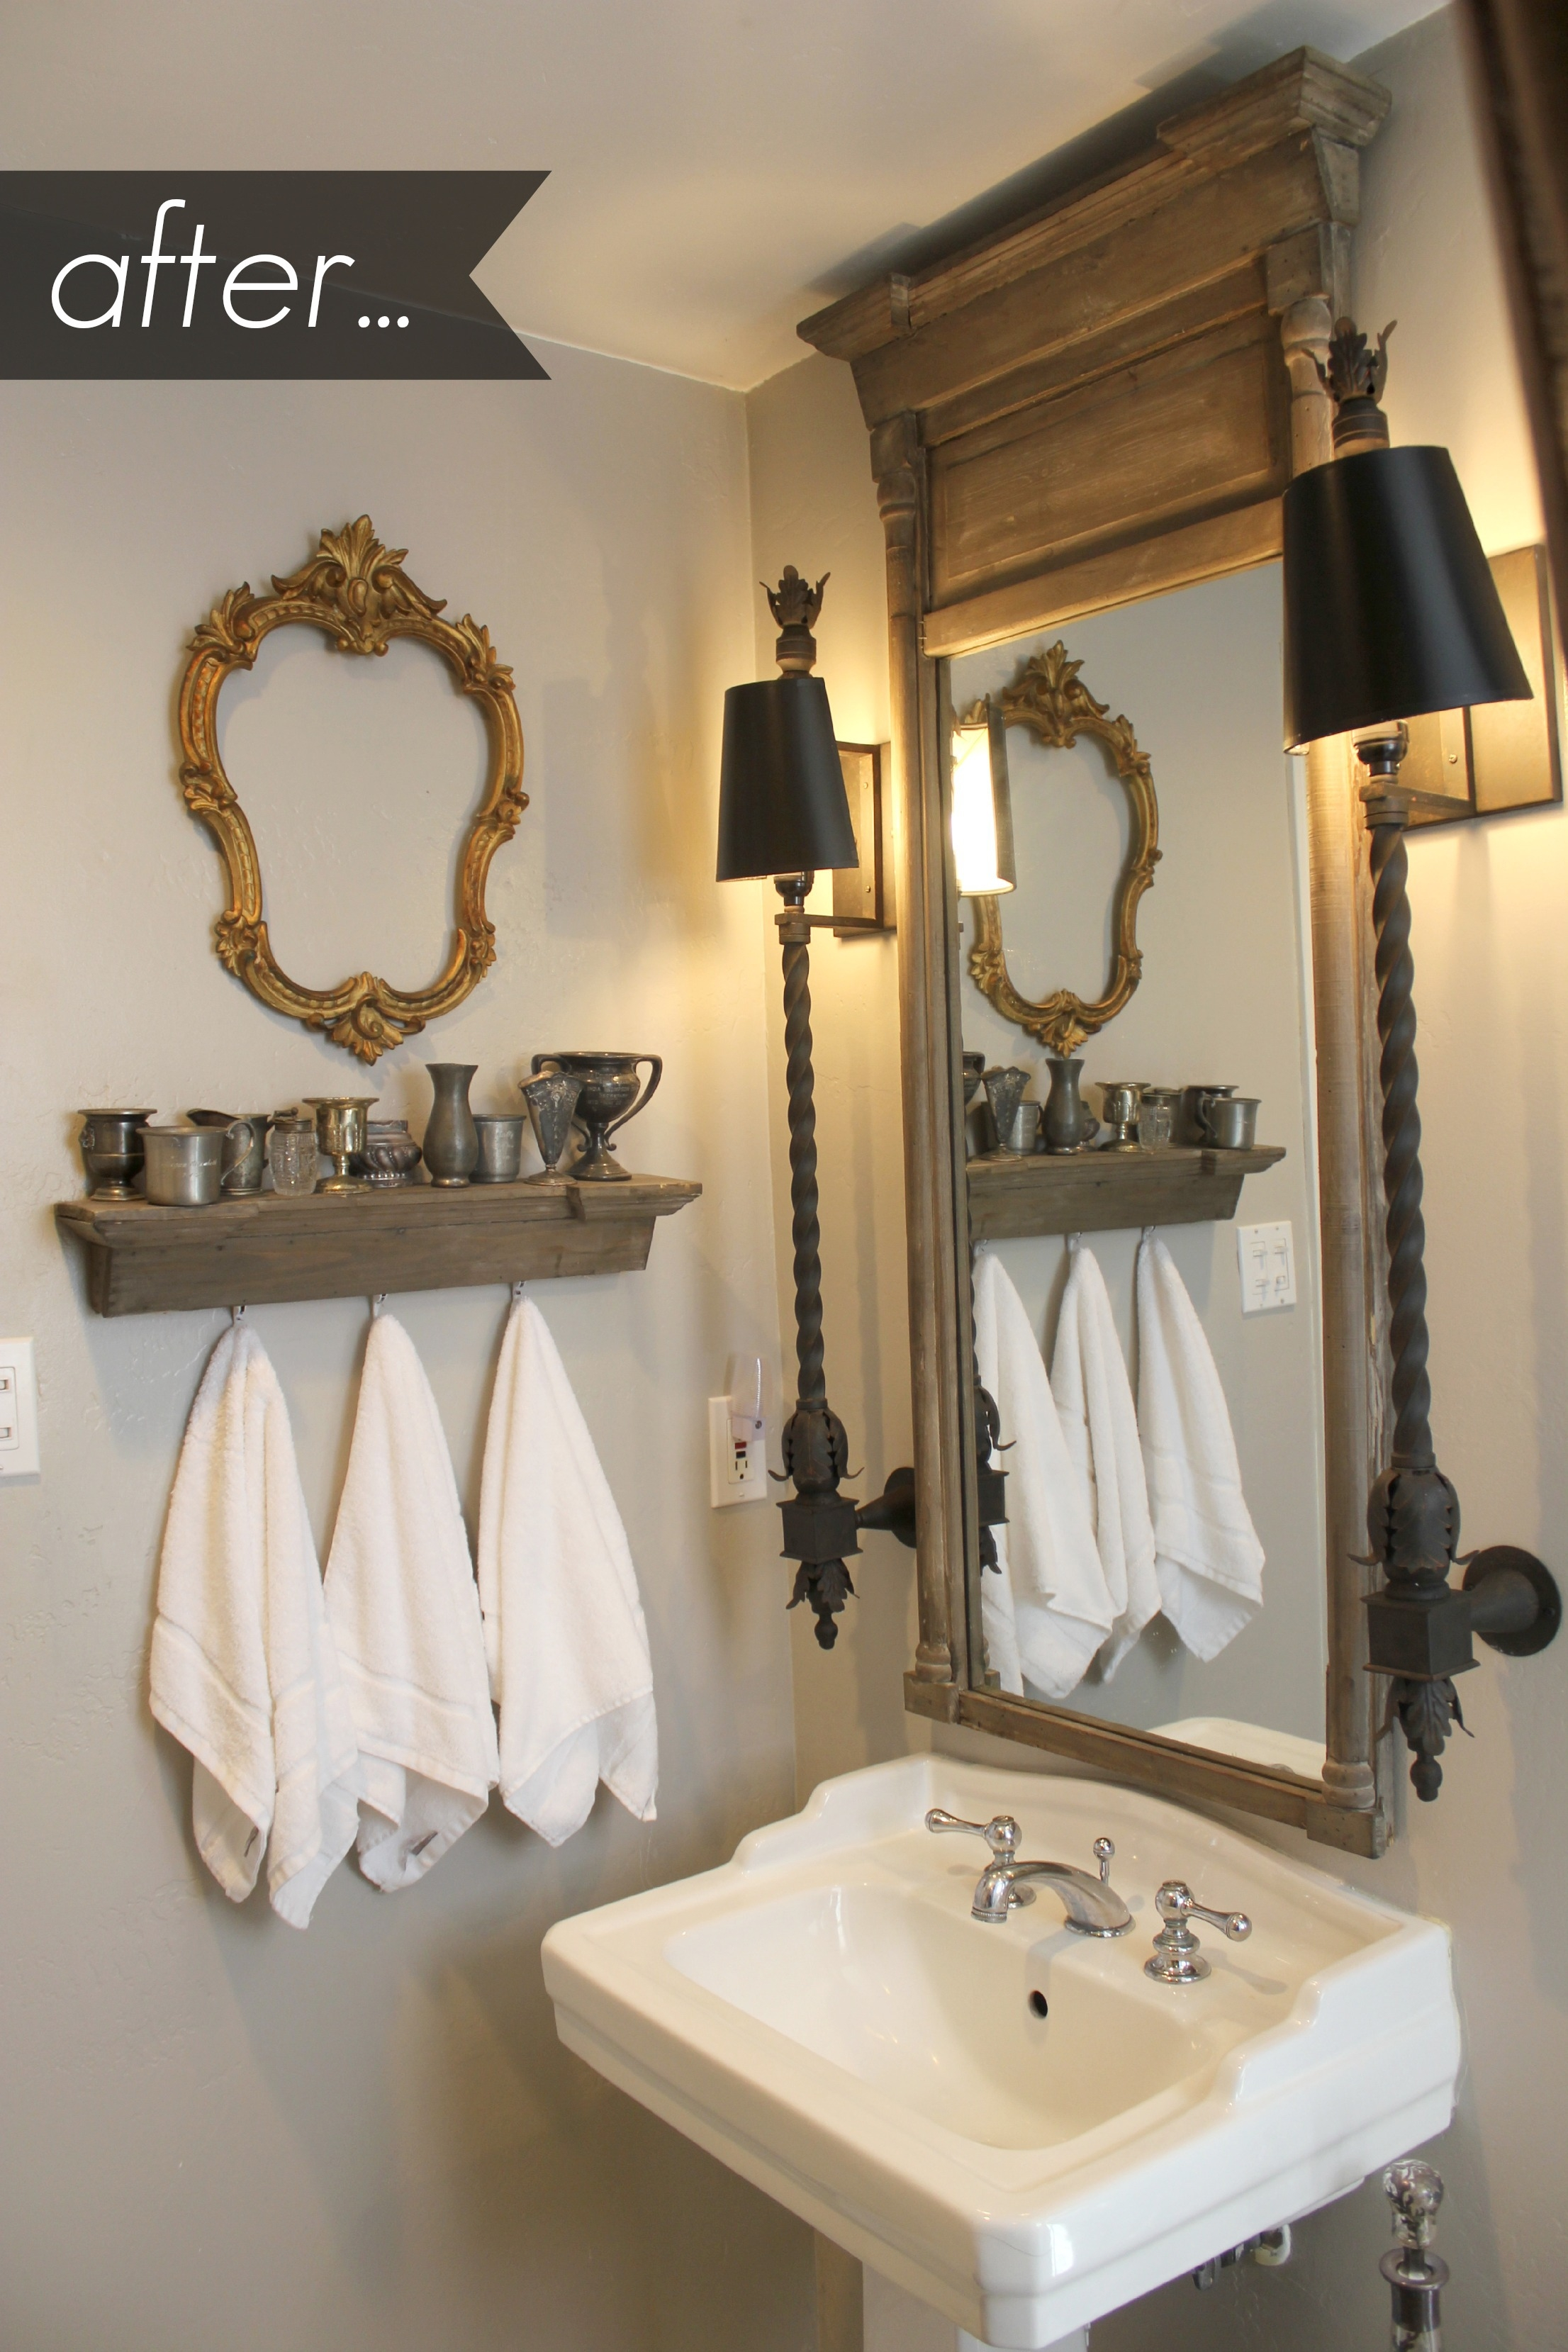 Antique Bathroom Mirror With Shelf